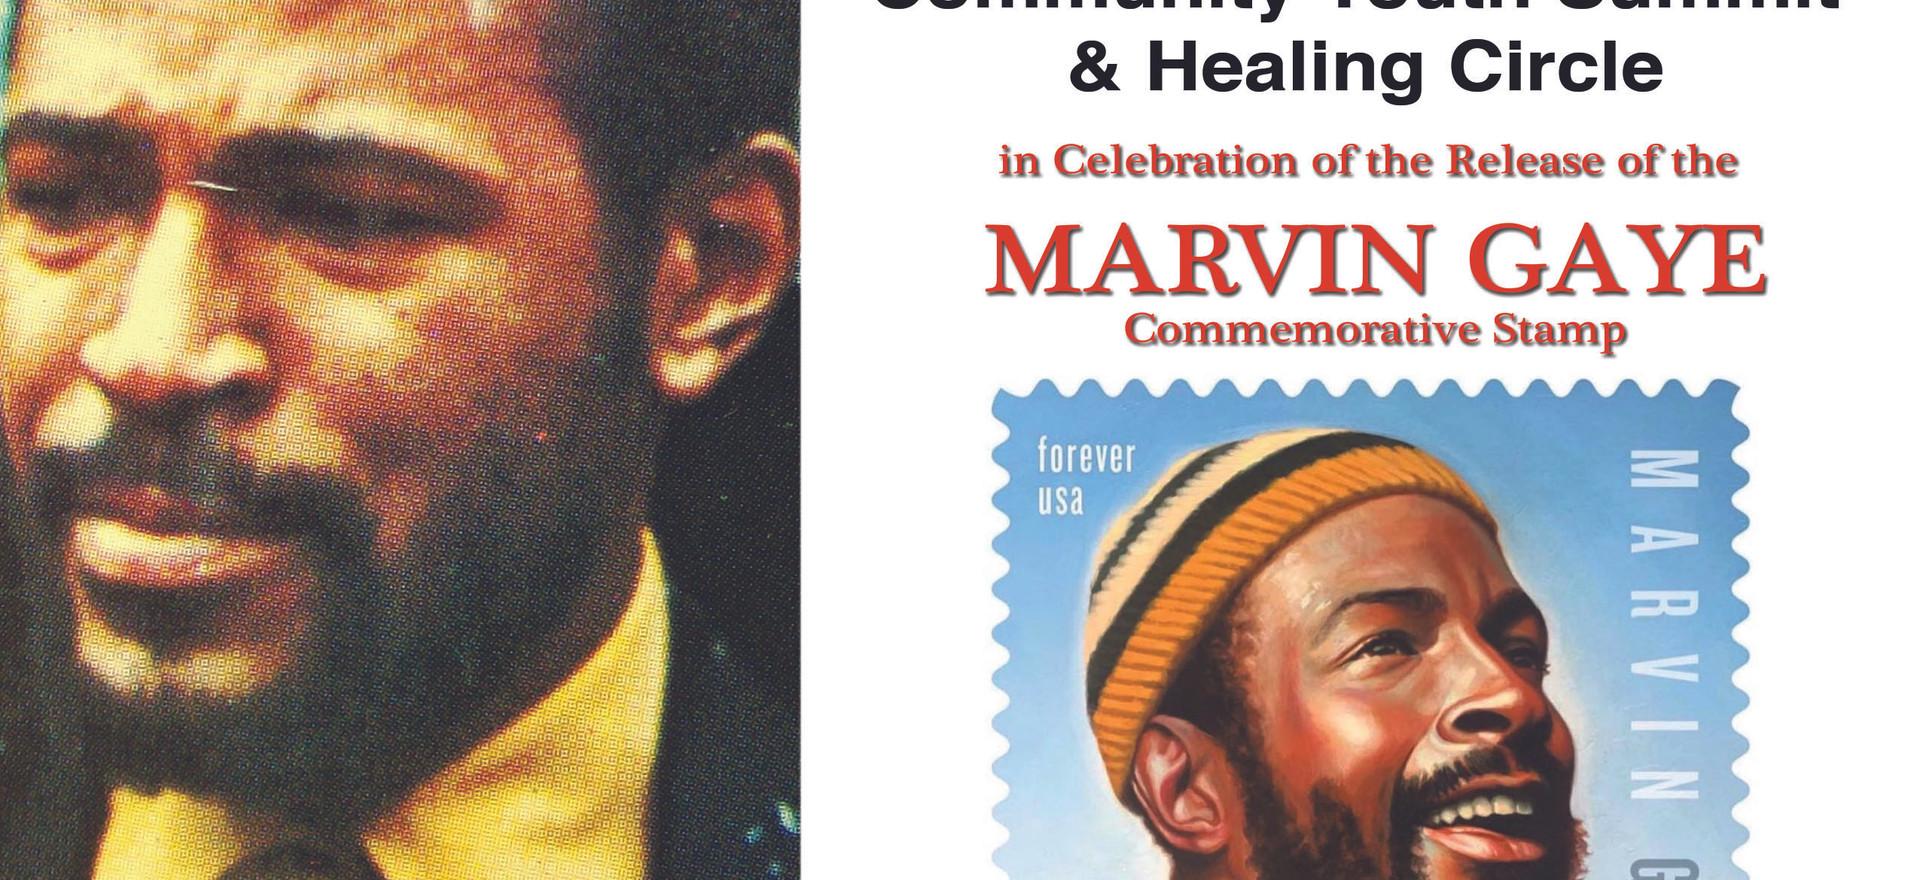 Marvin Gaye - Youth Forum final.jpg